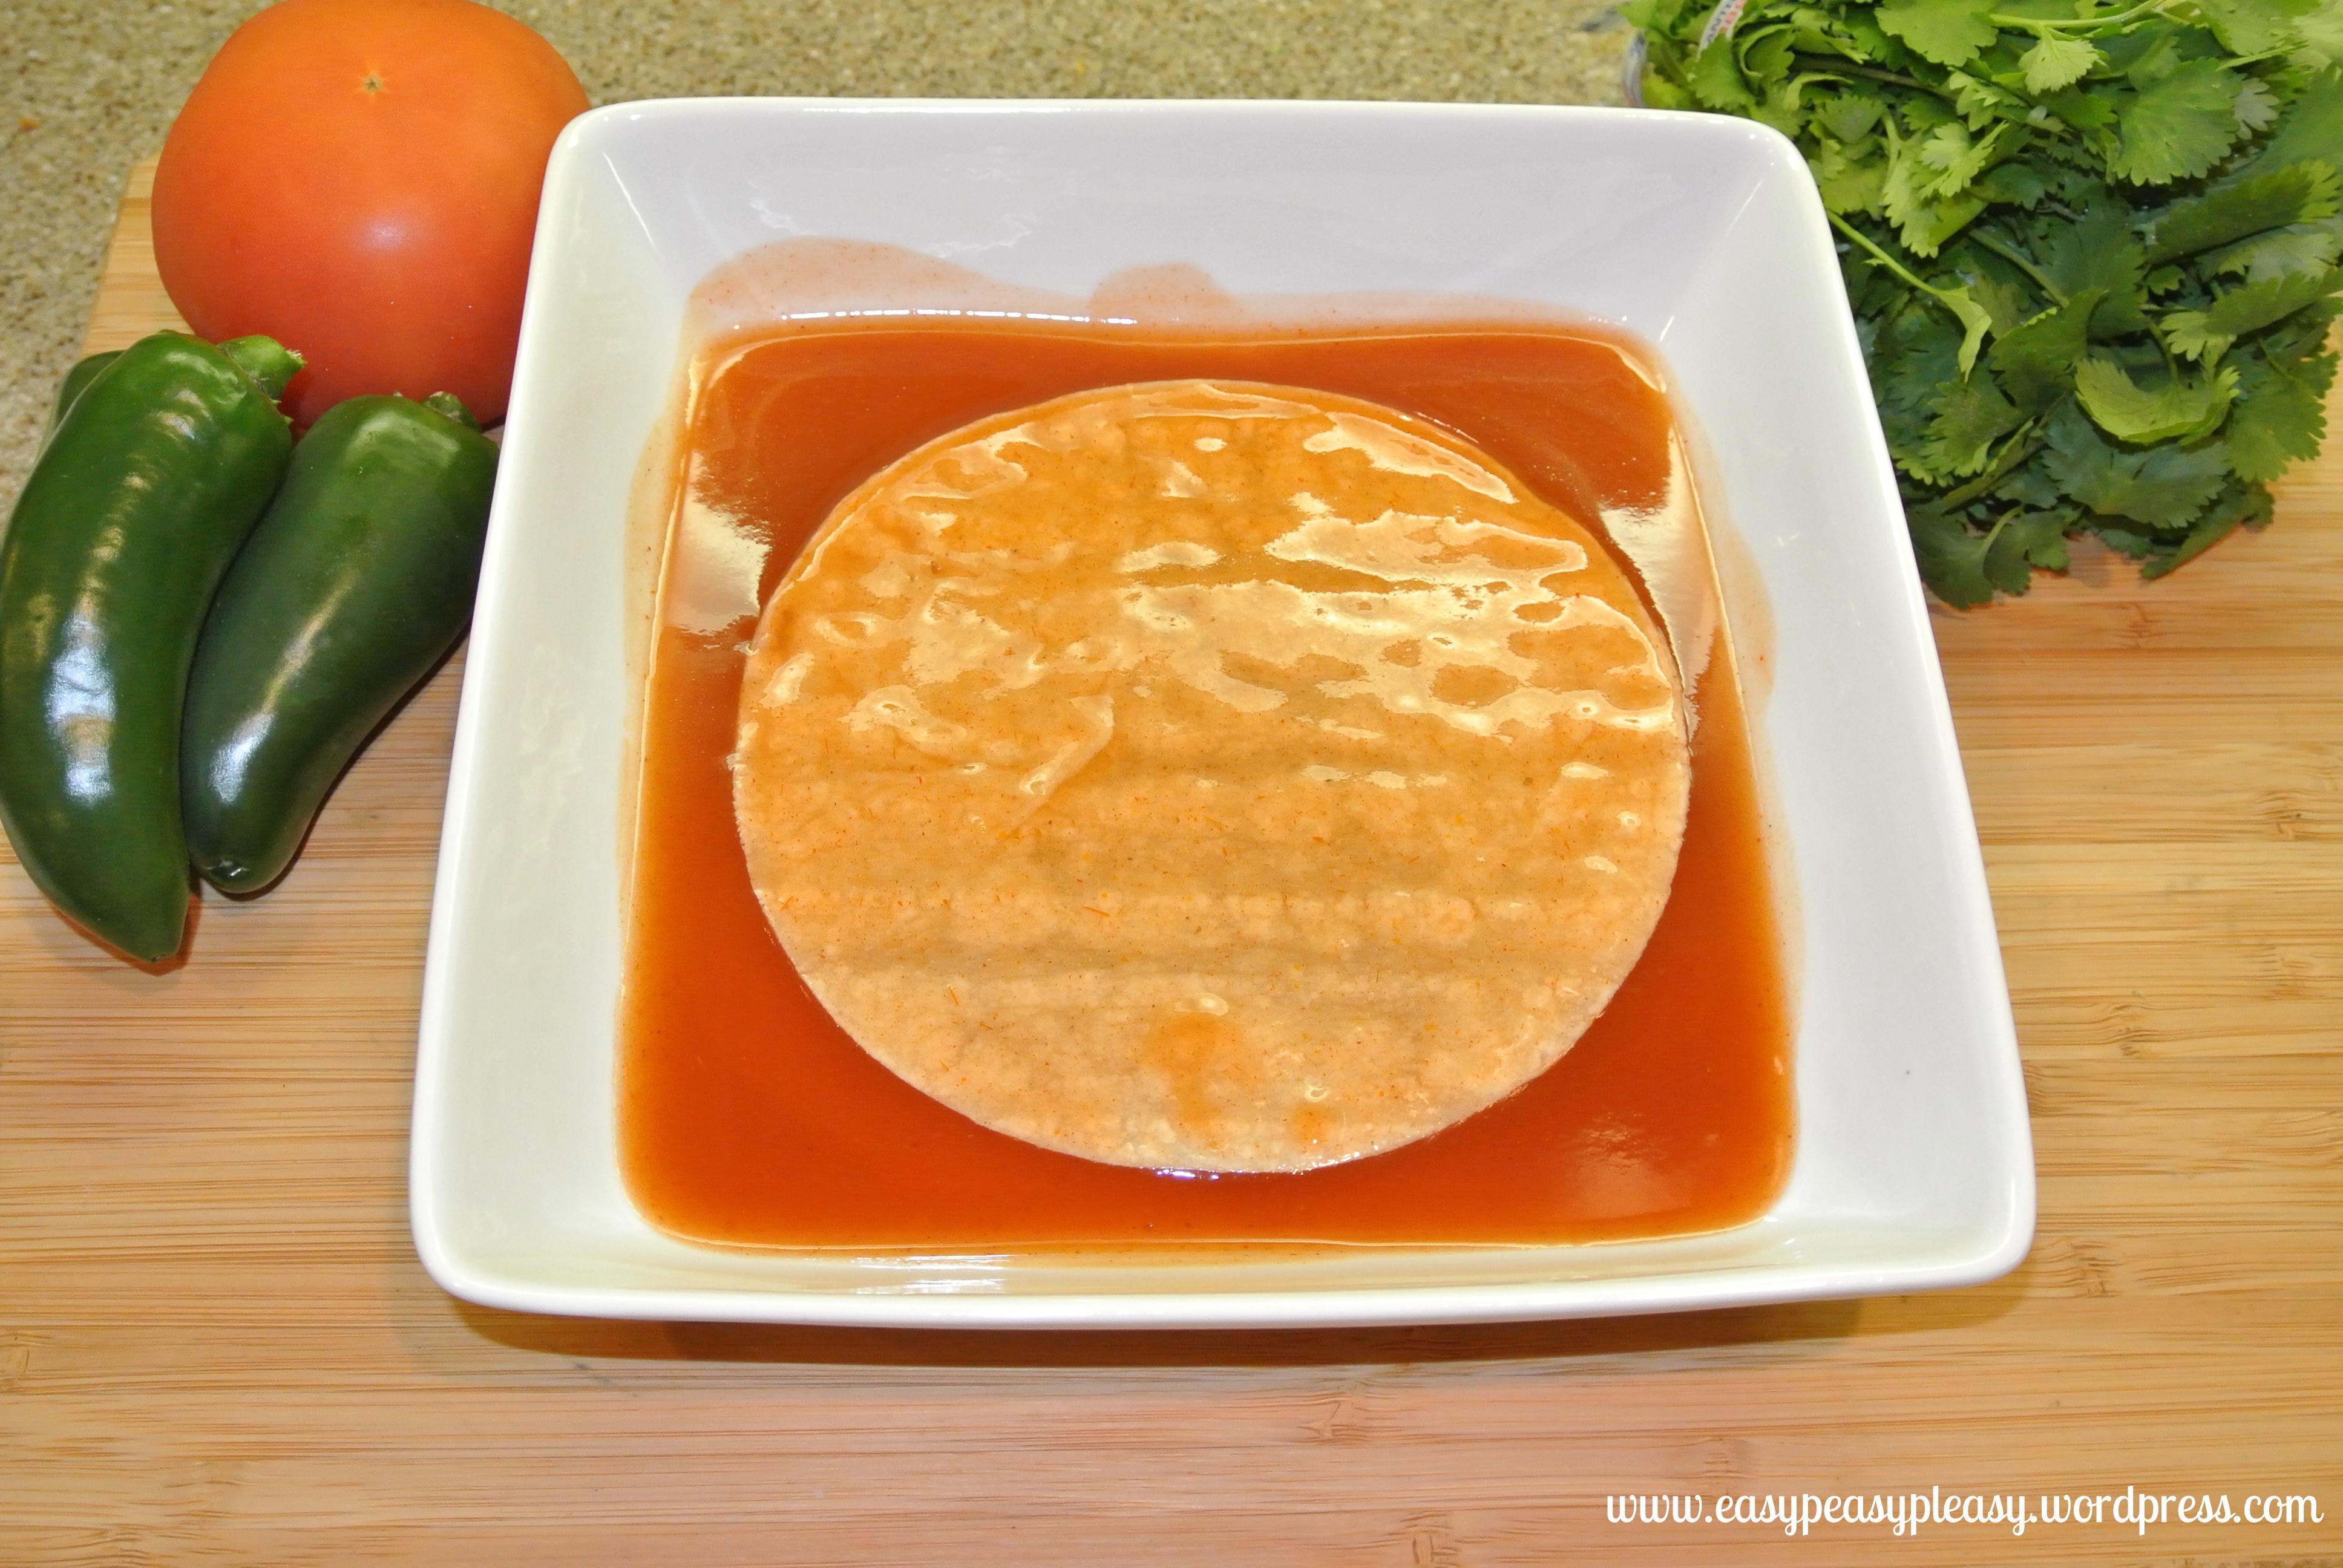 Turkey Enchilada Casserole adding flavor by running the corn tortilla through the enchilada sauce